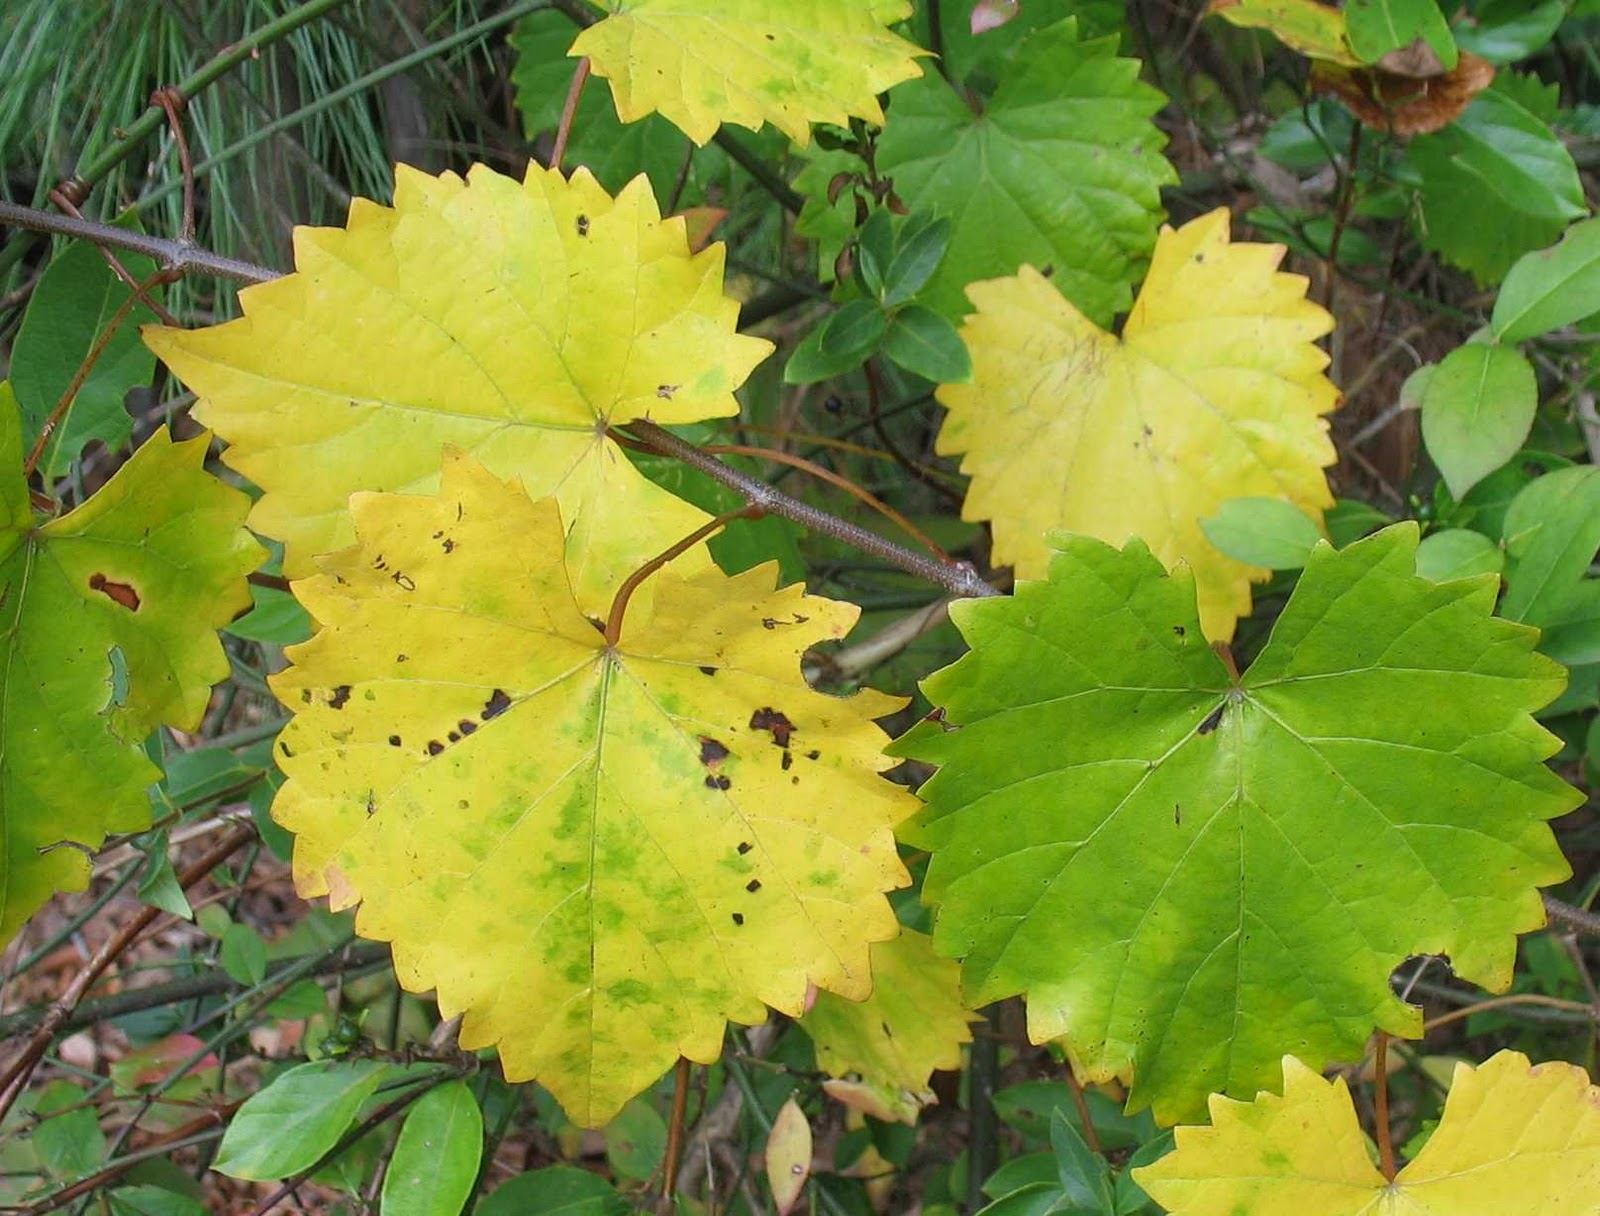 Using Georgia Native Plants: Native Fall Foliage - Yellow